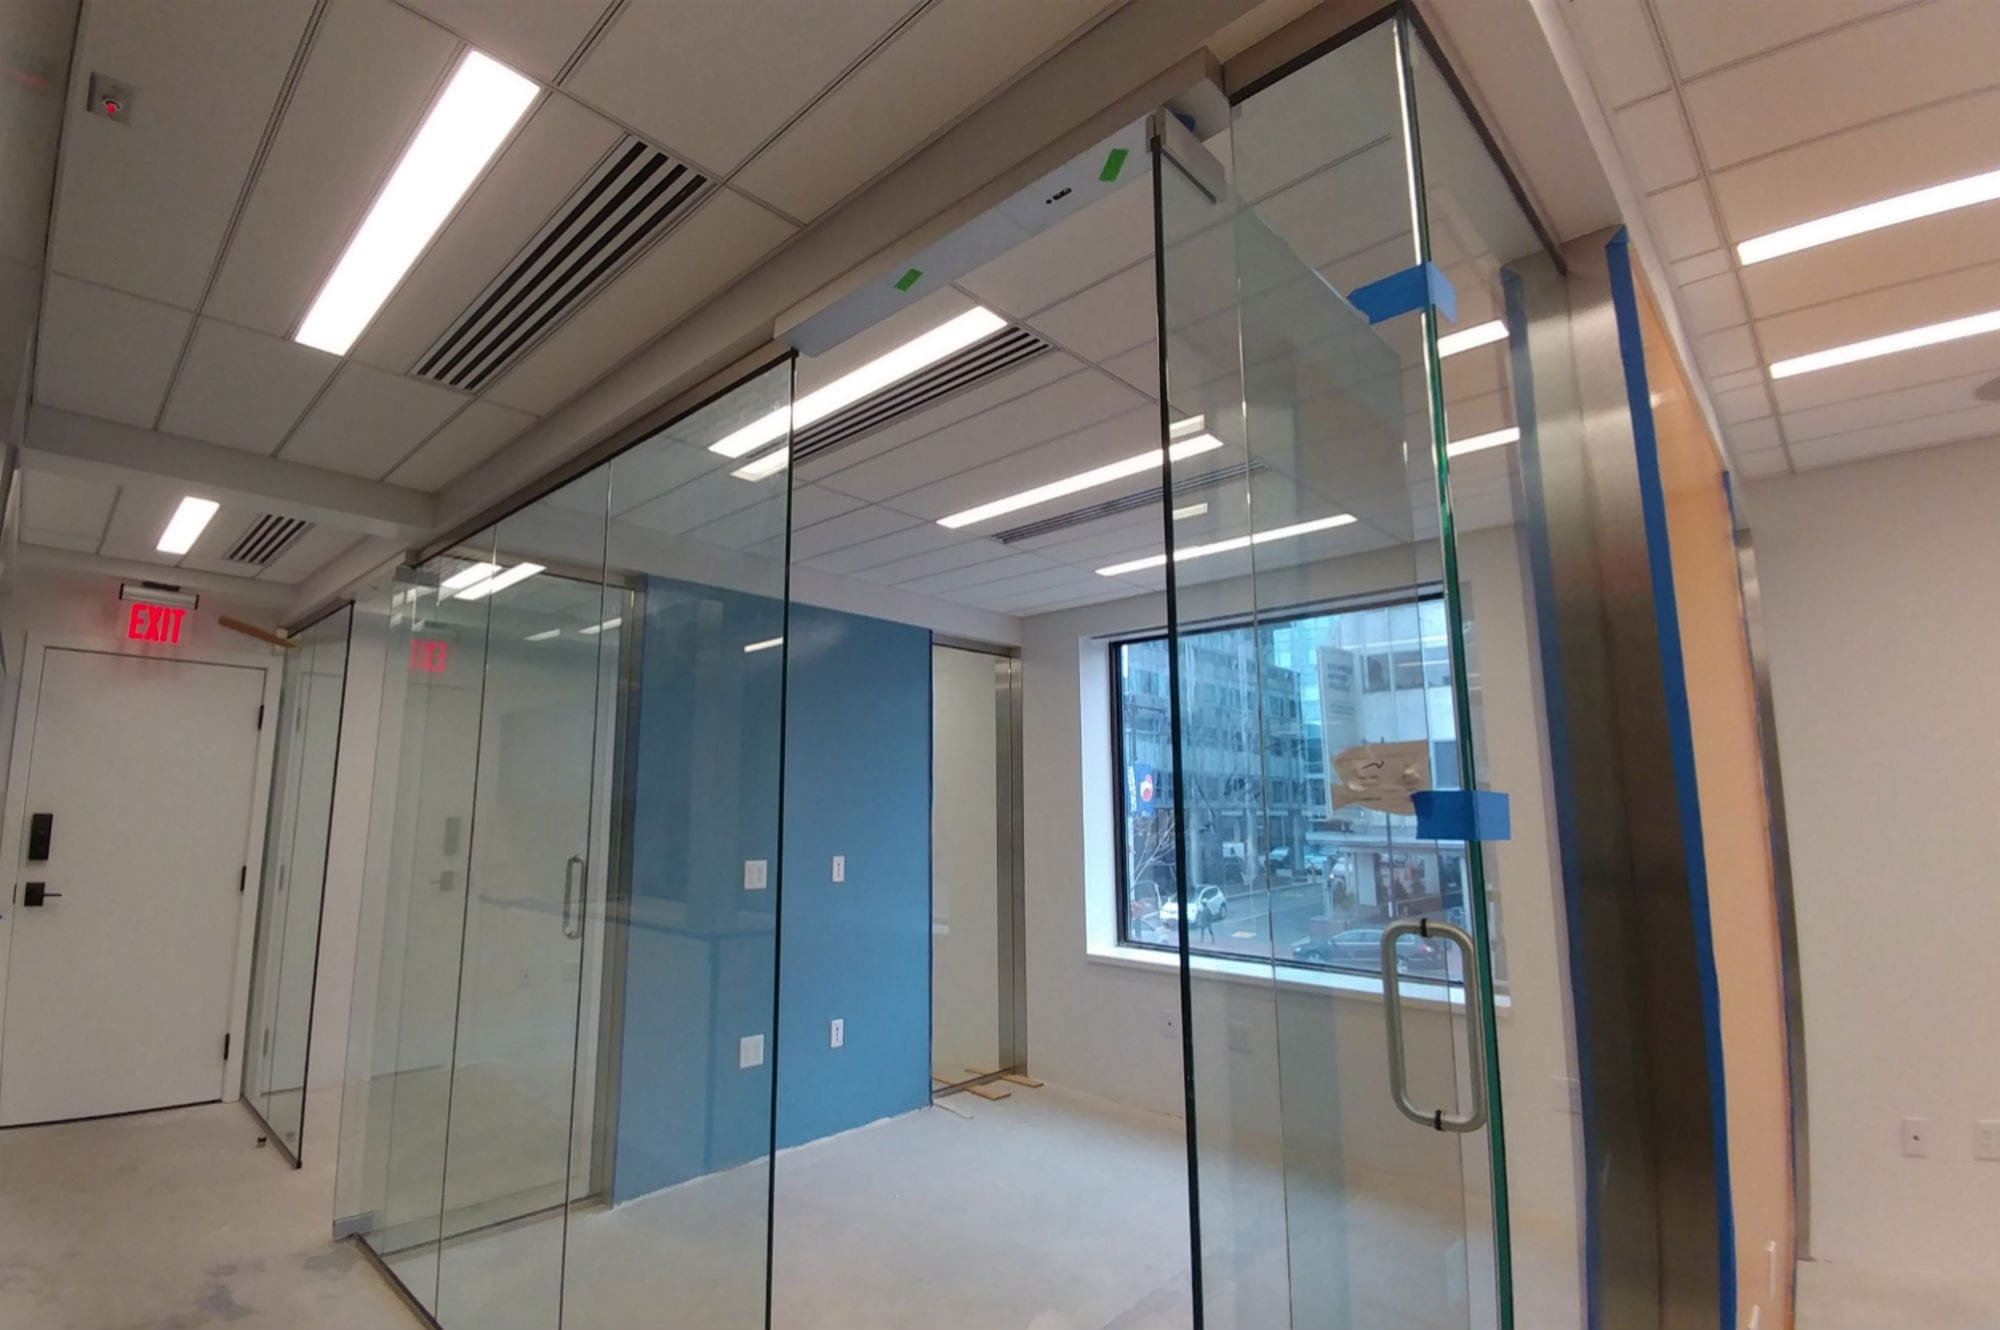 Cambridge St. Boston – Industrial  HVAC Project